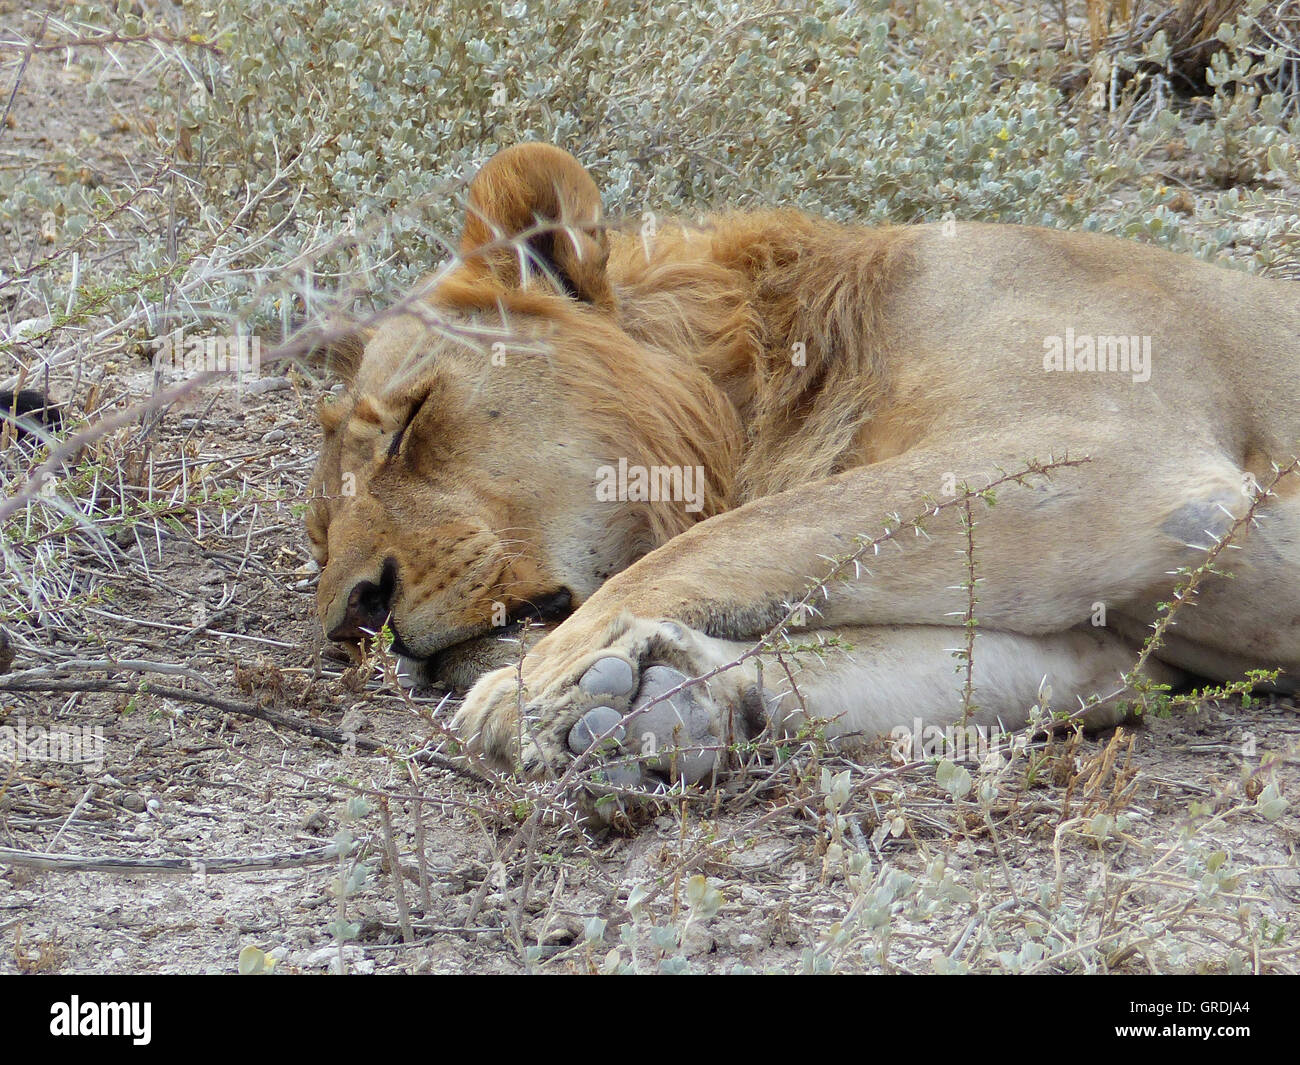 Sleeping Lion, Male Lion - Stock Image